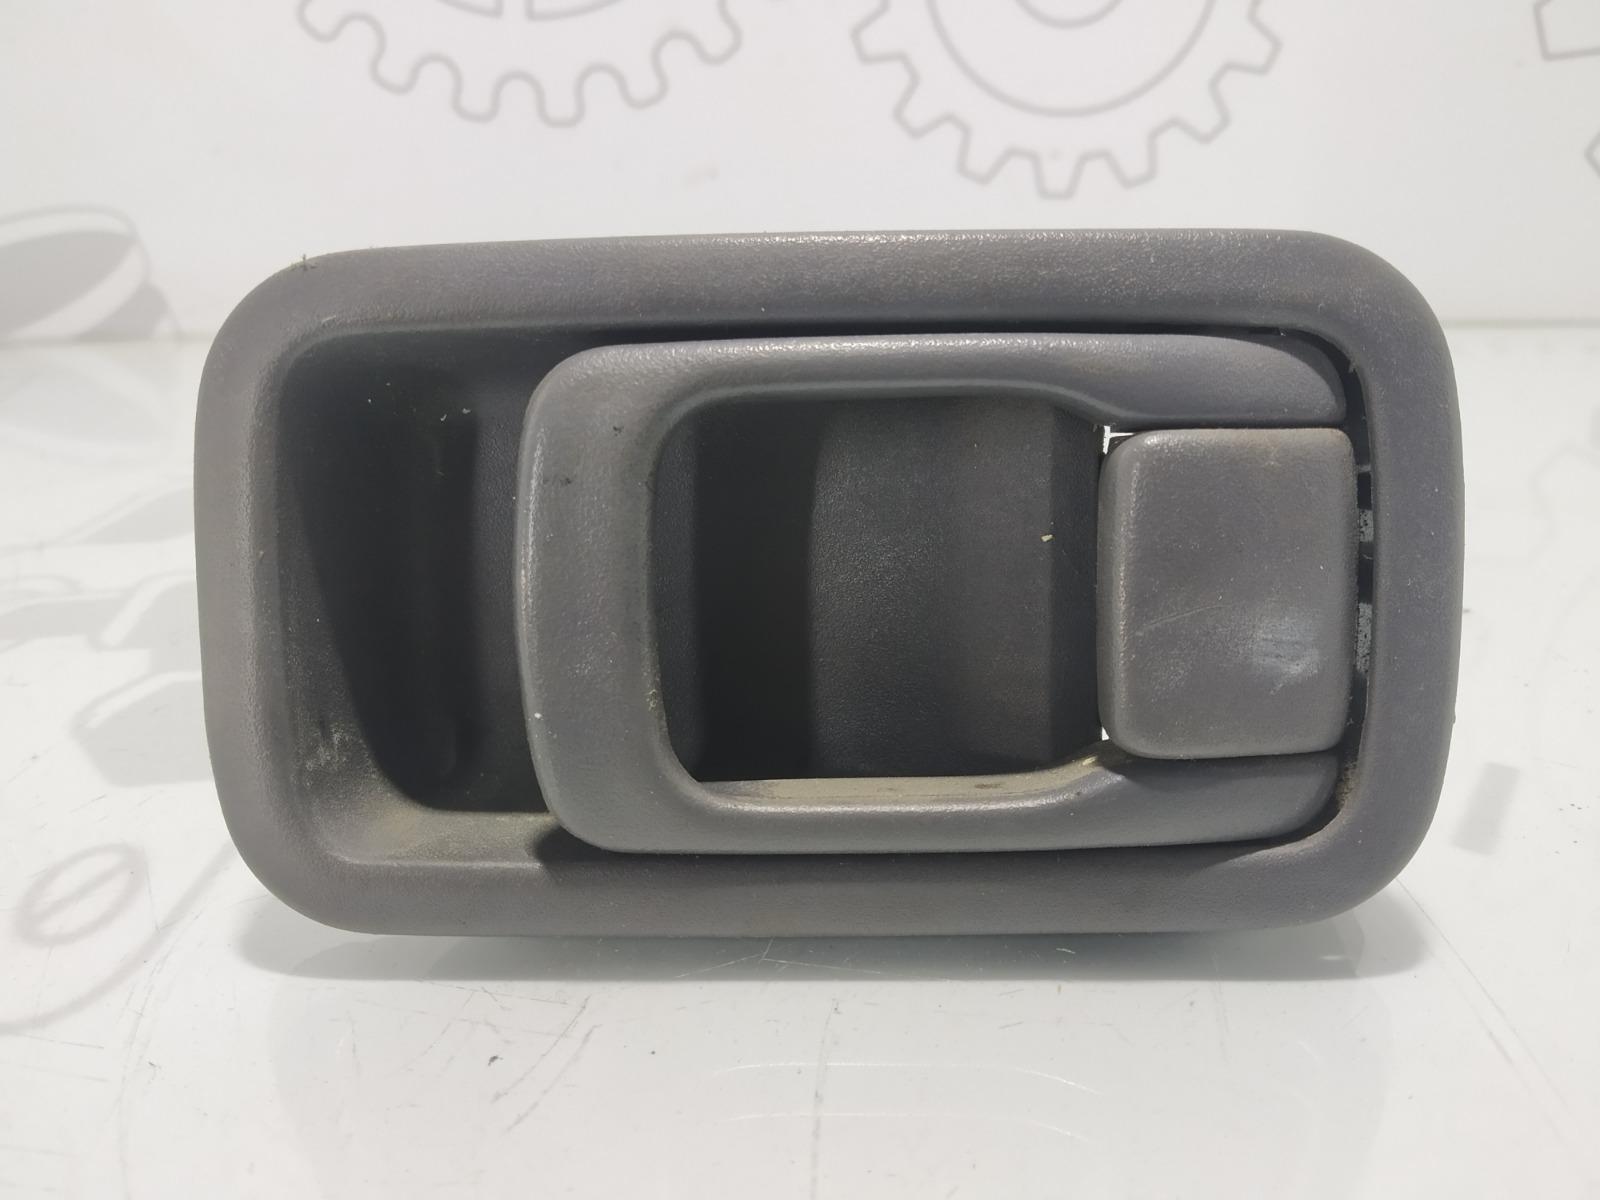 Ручка внутренняя передняя правая Nissan Vanette C23 2.3 D 2001 (б/у)